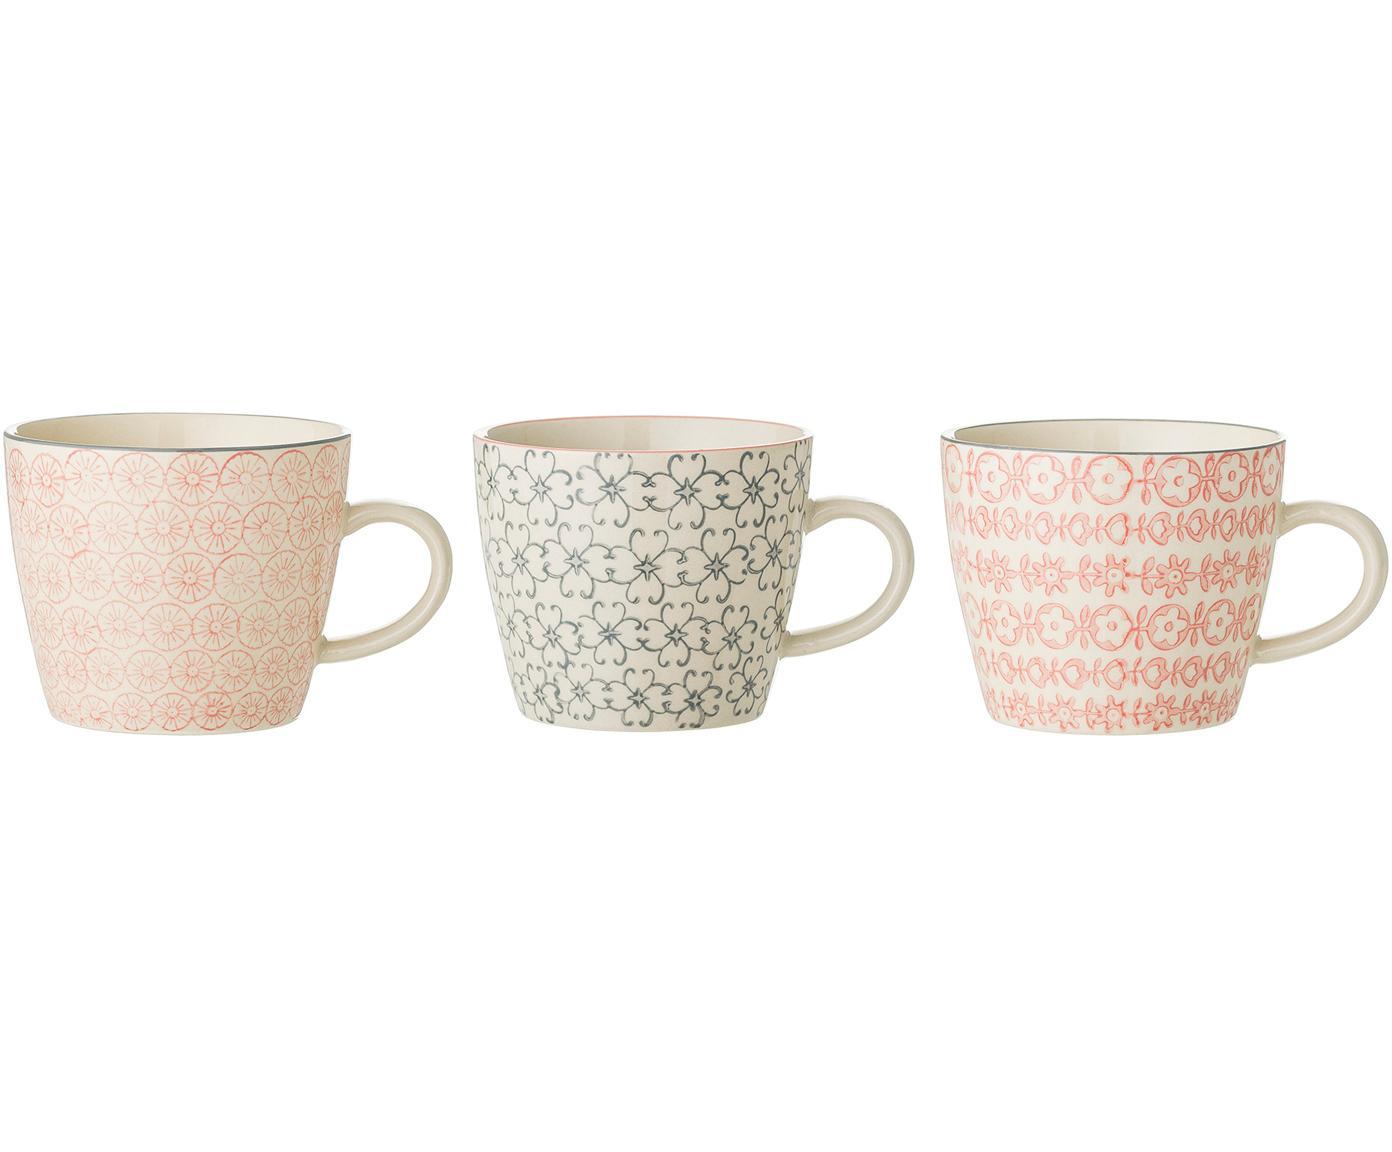 Set de tazas Cécile, 3pzas., Gres, Multicolor, Ø 10x Al 8 cm